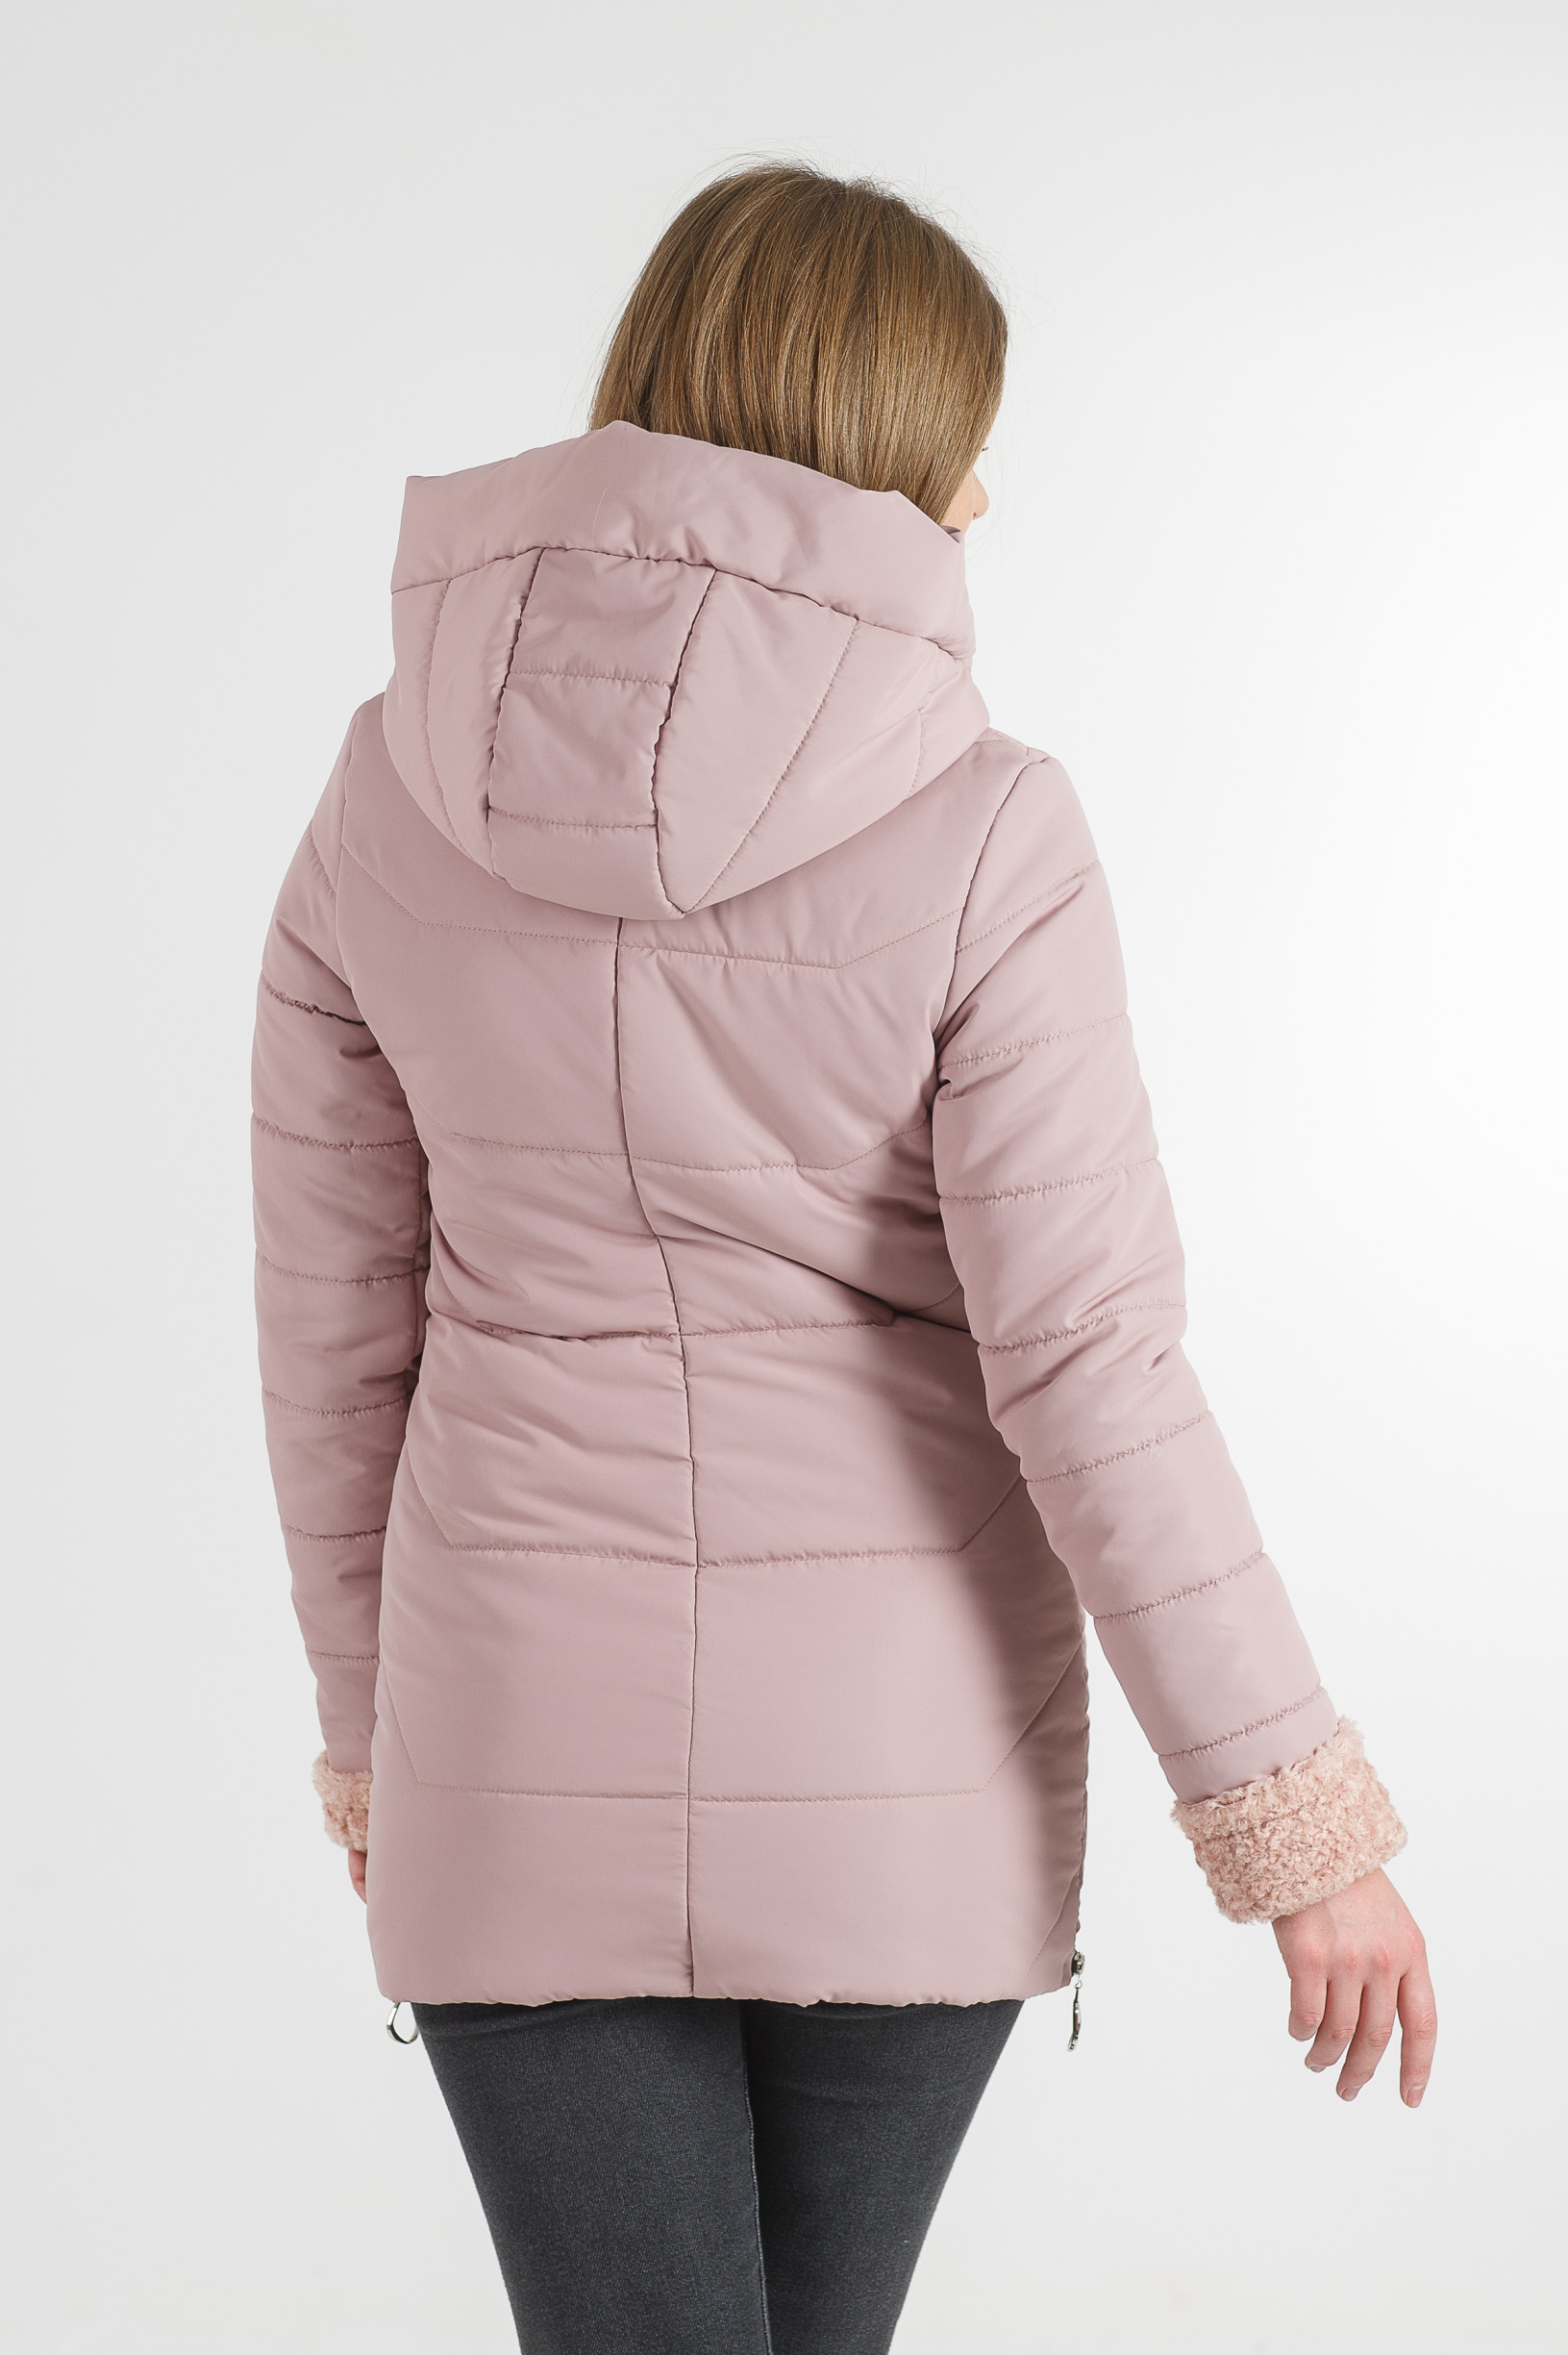 Тёплая весенняя удлинённая розовая куртка Фокси